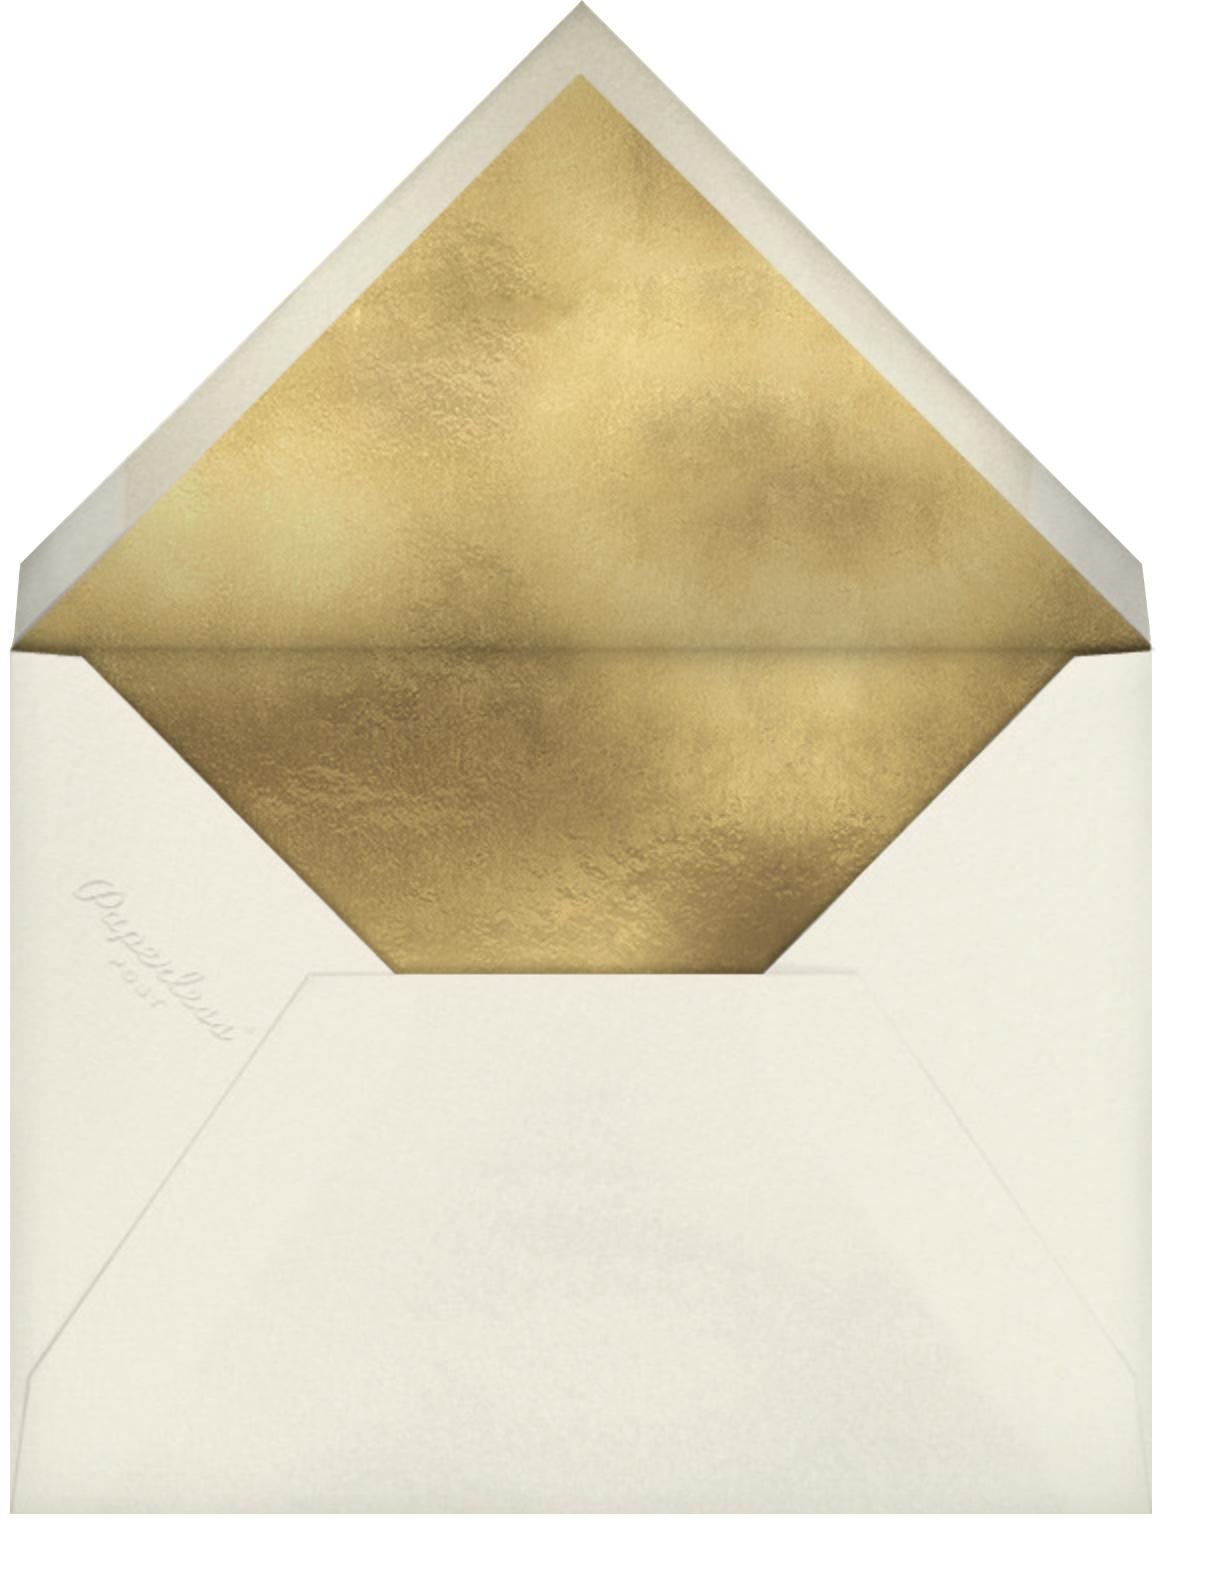 Opulent - Gold - Schumacher - Envelope